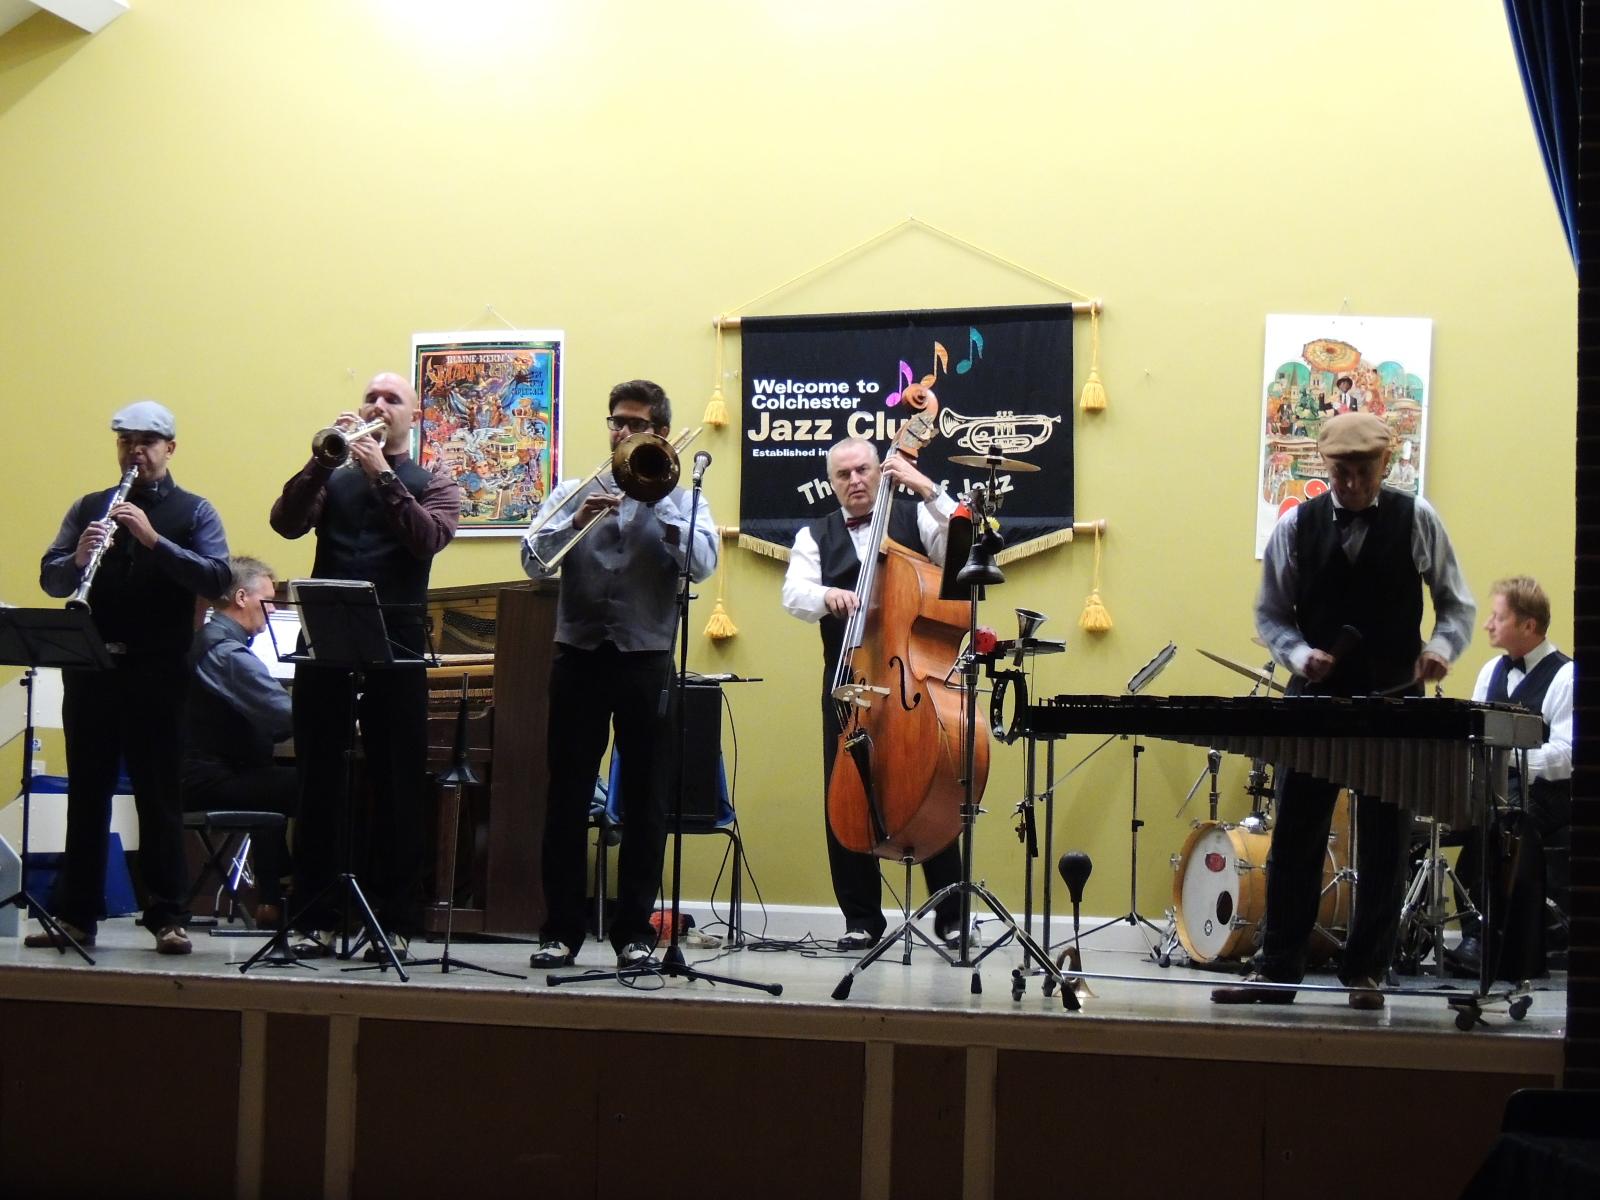 Ragtime Jazz Band The Ragtime Jazz Band